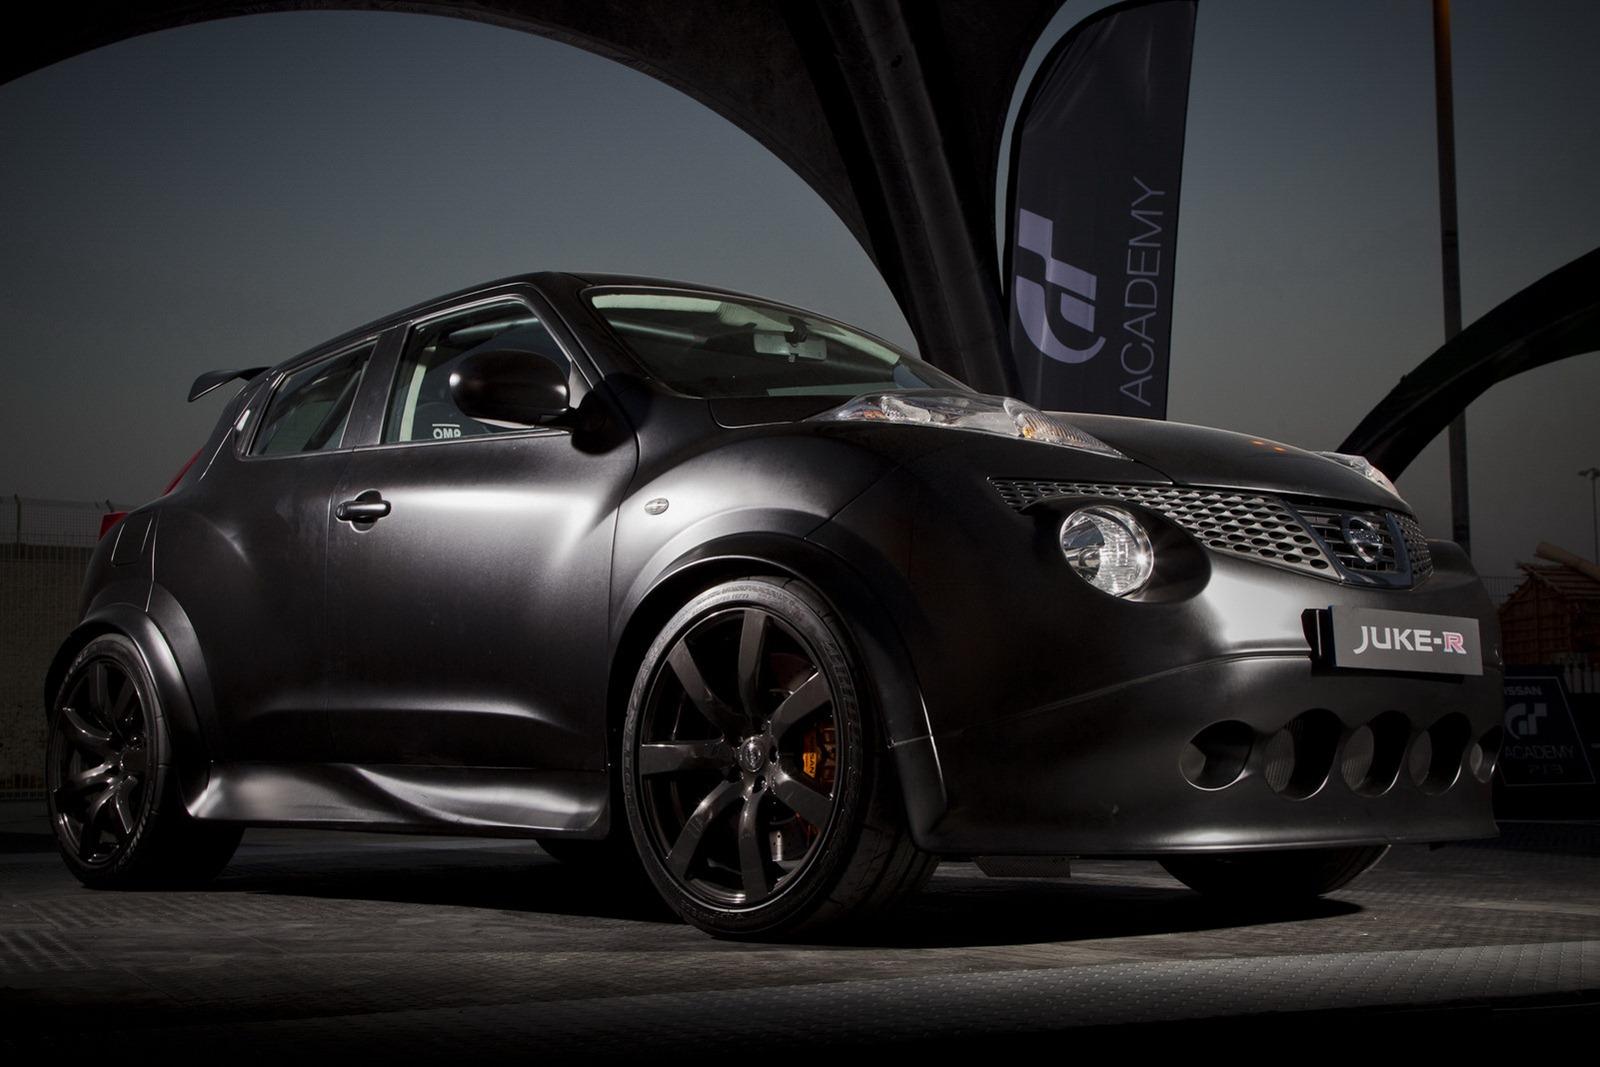 .: Carros importados Nissan JUKE-R